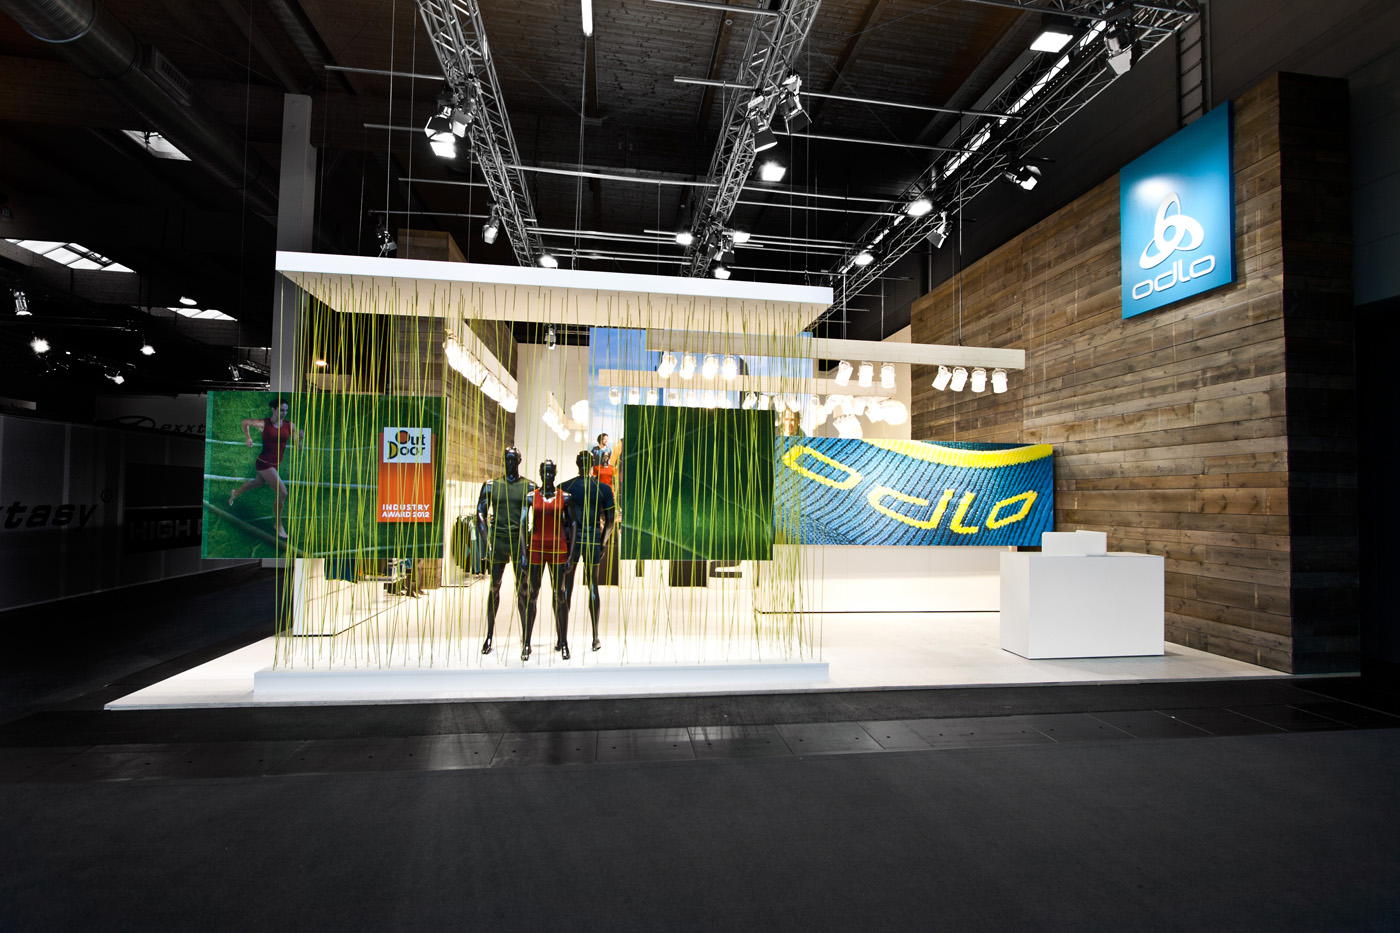 Corner Exhibition Stands Yard : Laborrotwang berlin odlo at outdoor